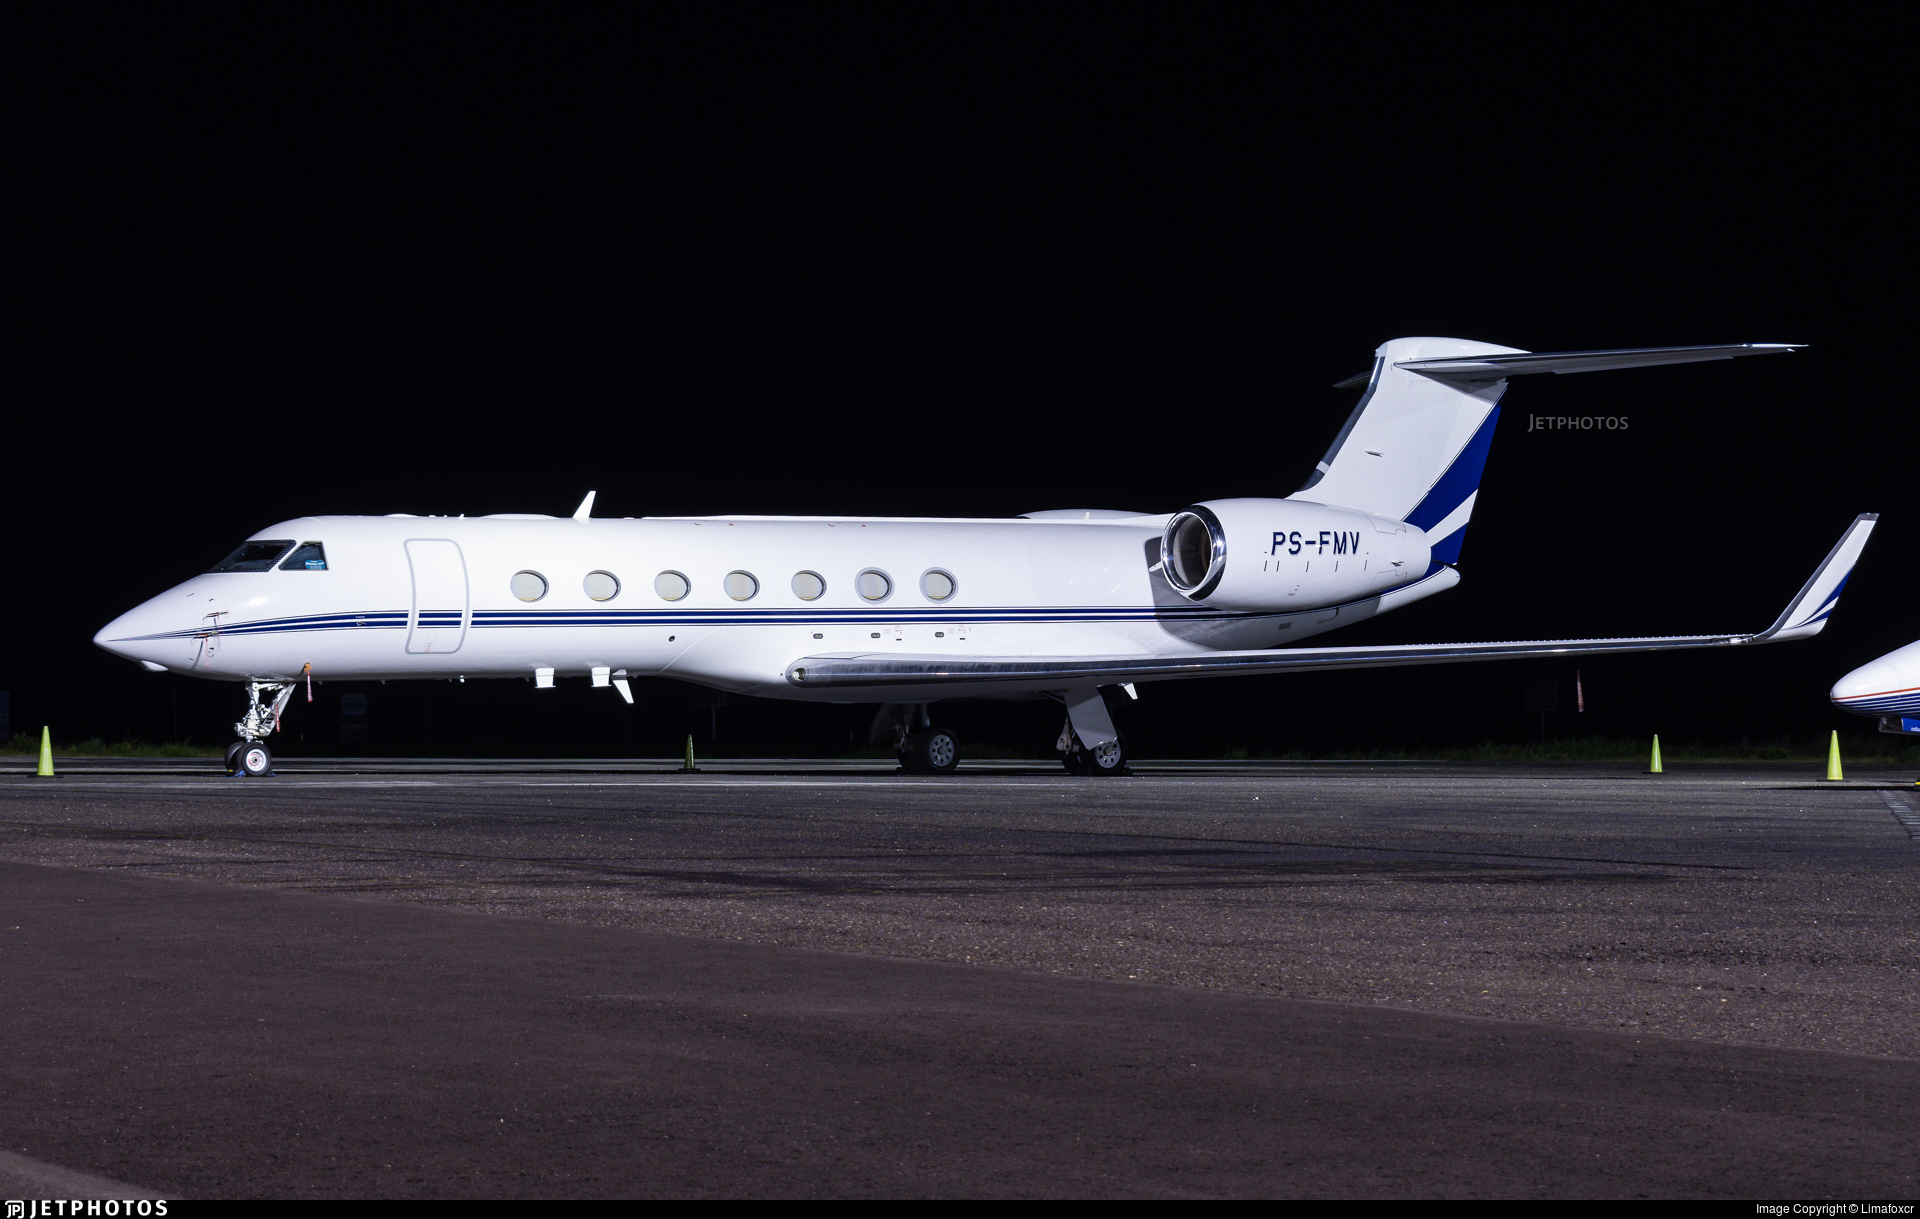 PS-FMV - Gulfstream G550 - Private